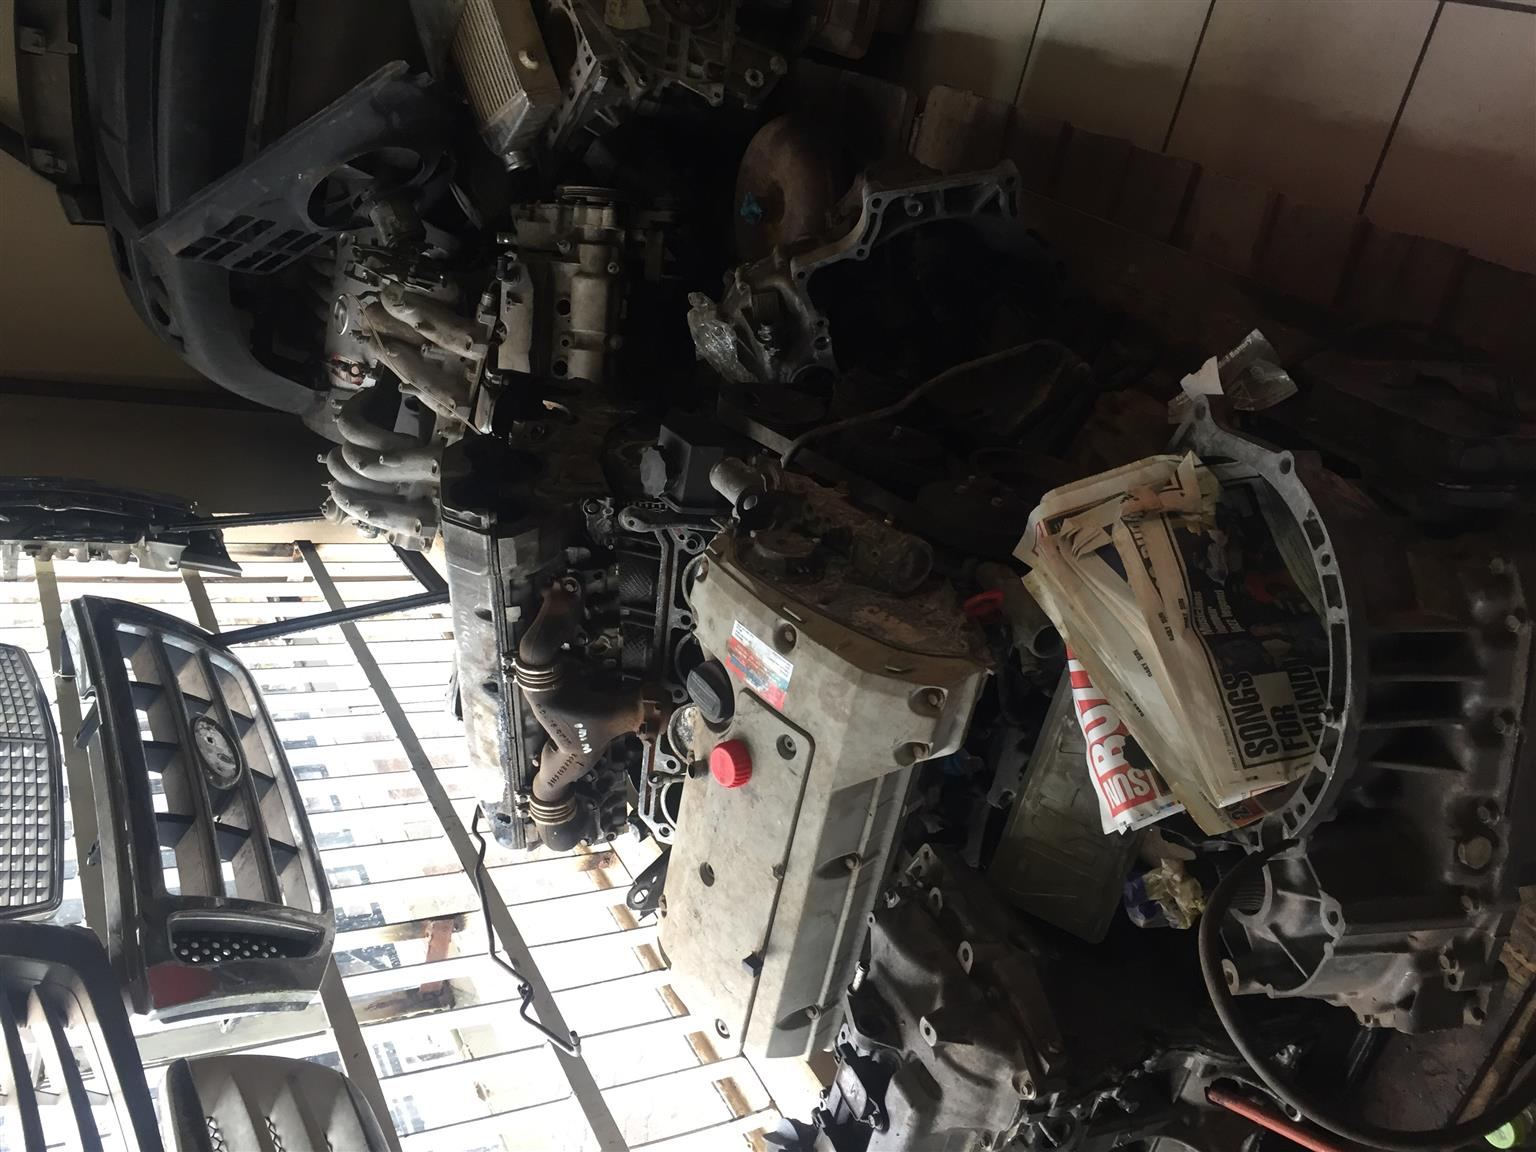 Mercedes Benz W210 111 engine for sale